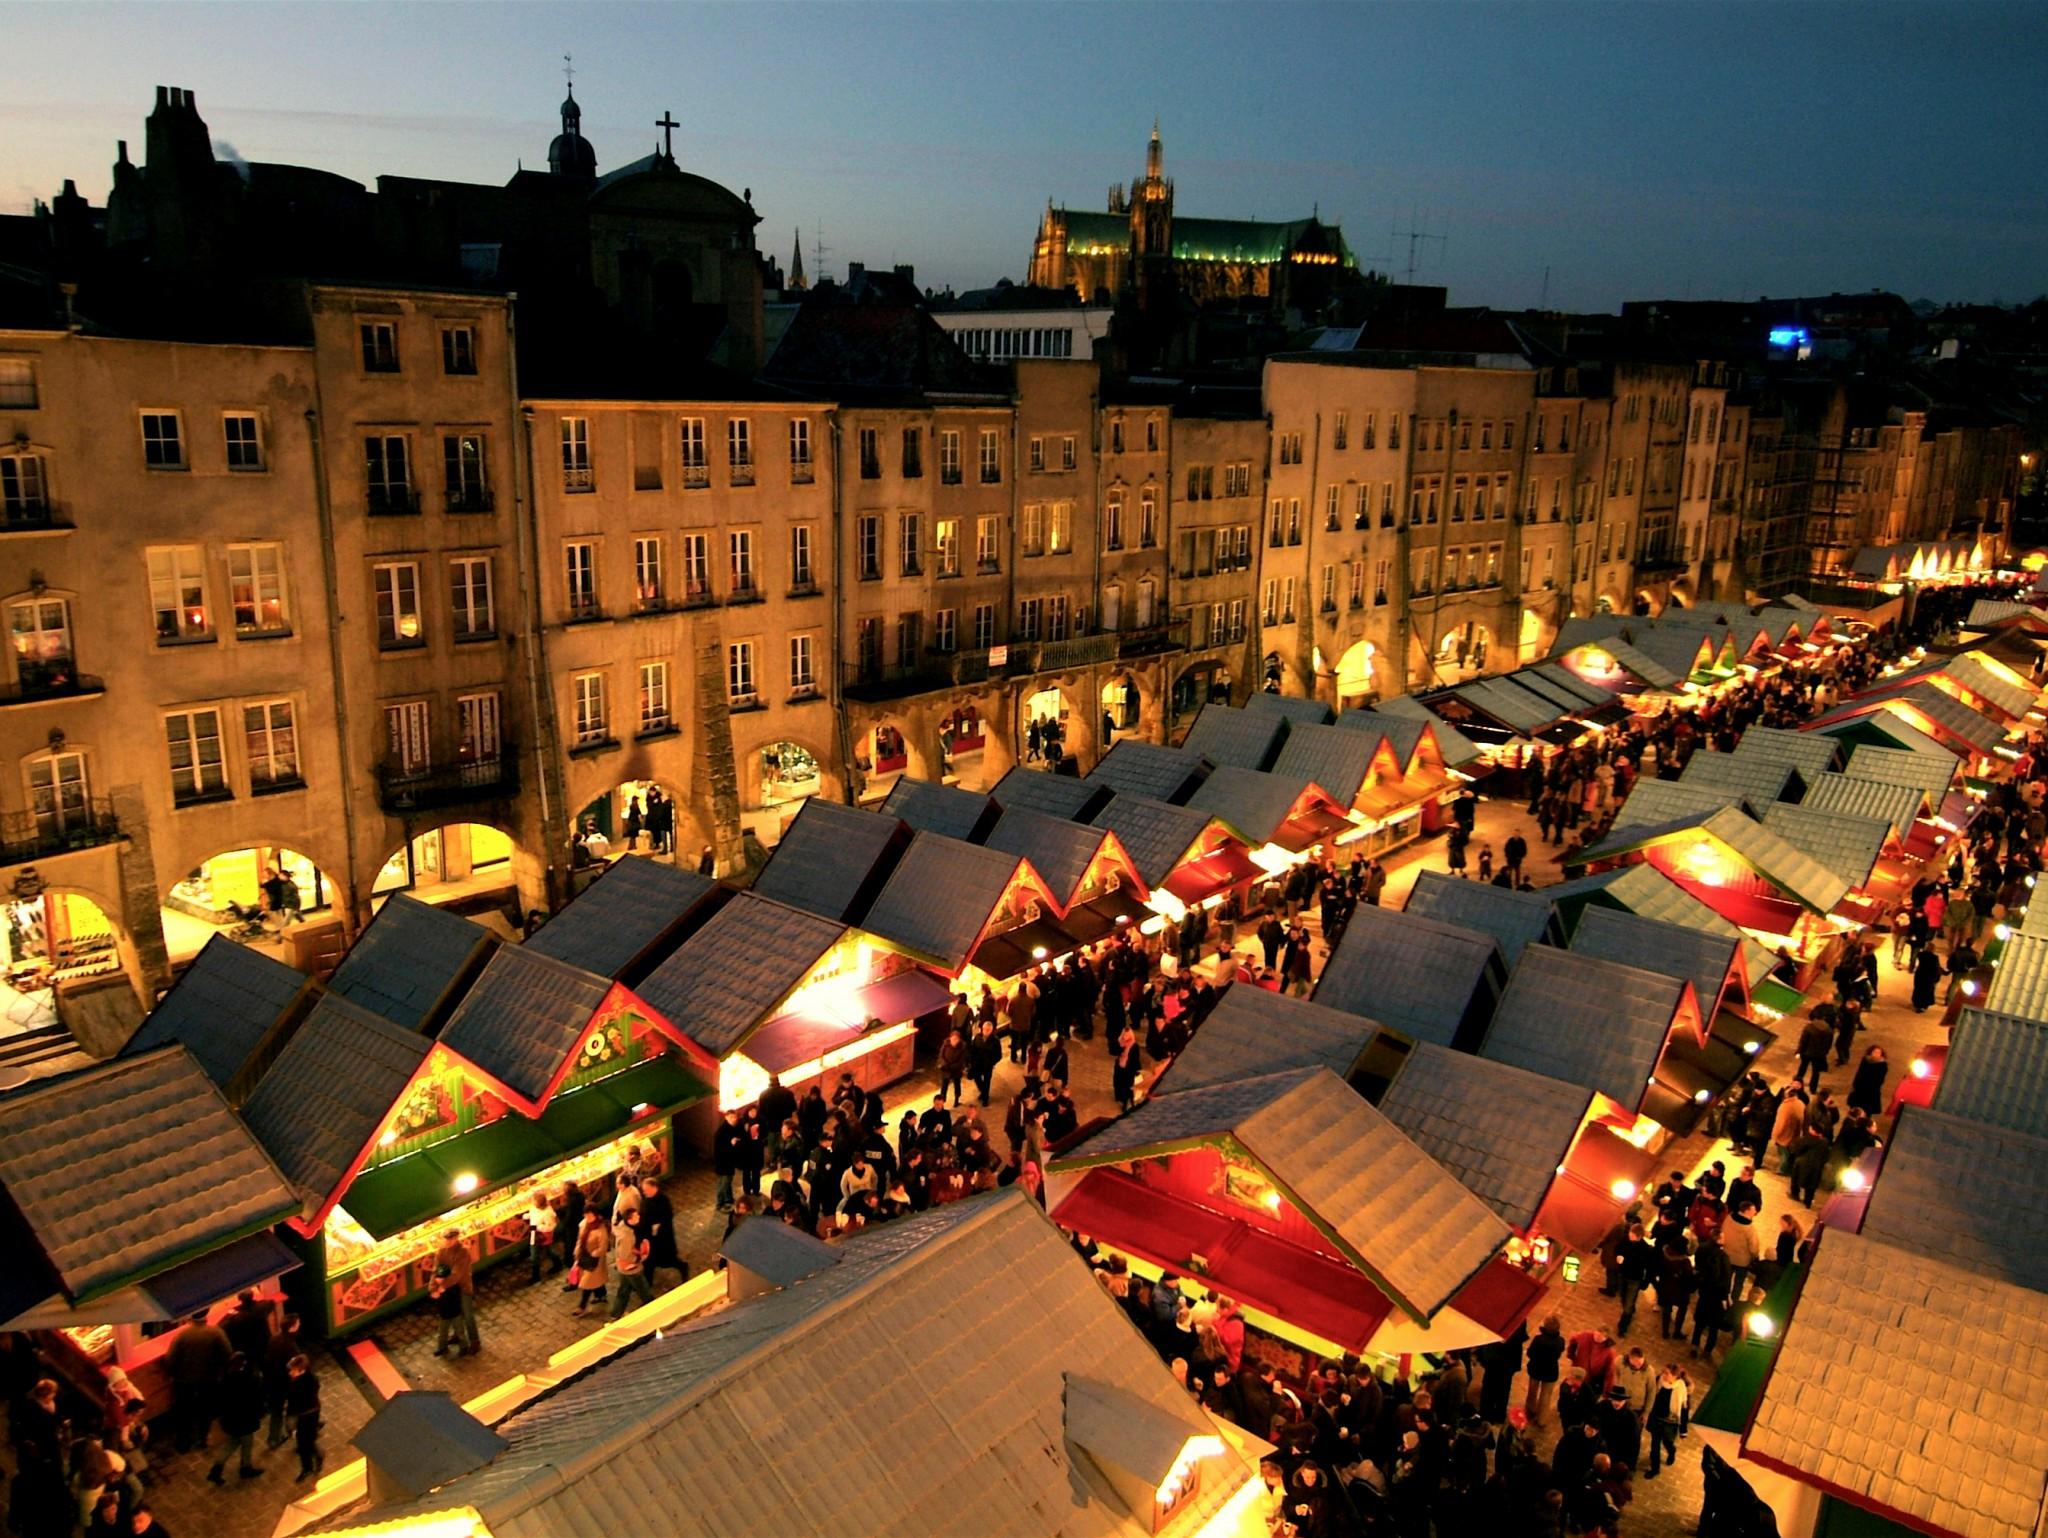 marche noel metz 2018 date Discover the Metz Christmas Market in Lorraine   French Moments marche noel metz 2018 date